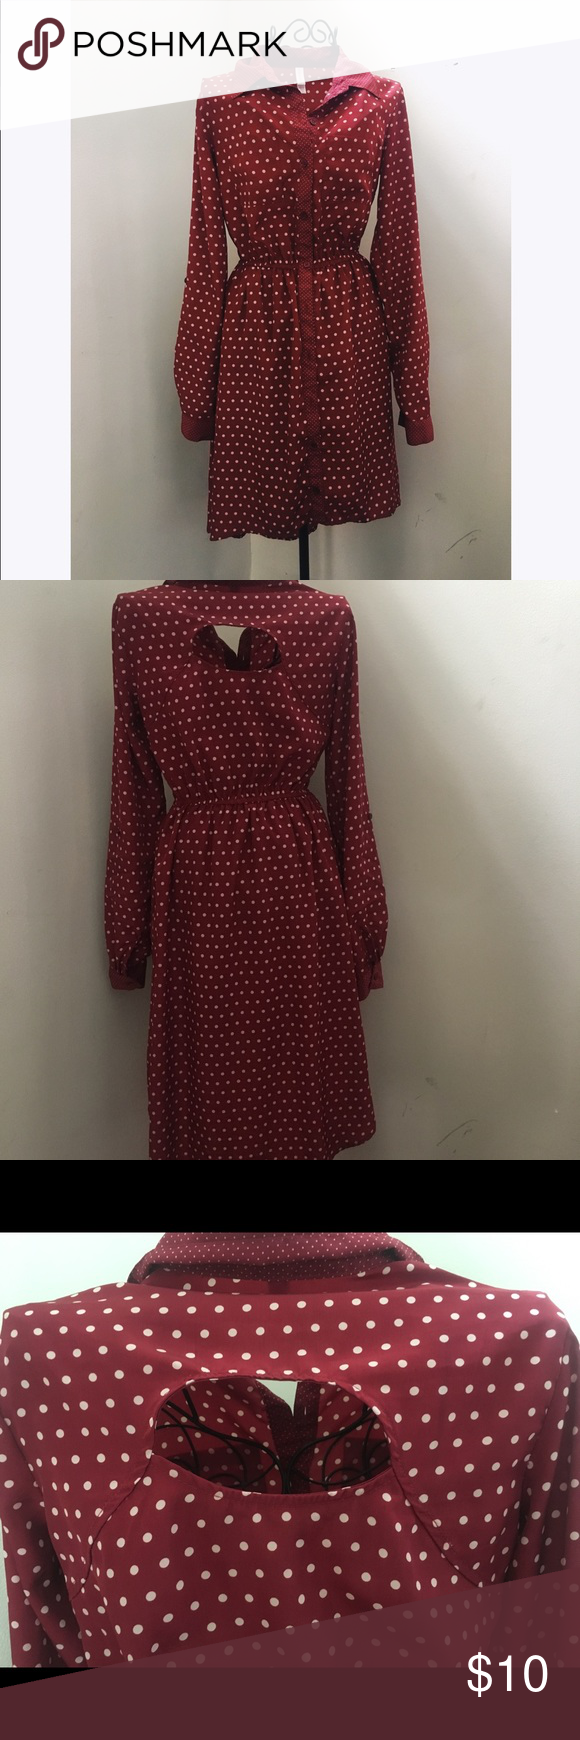 Red Polka Dot Dress With Cutout Red Polka Dot Dress Dot Dress Polka Dot Dress [ 1740 x 580 Pixel ]